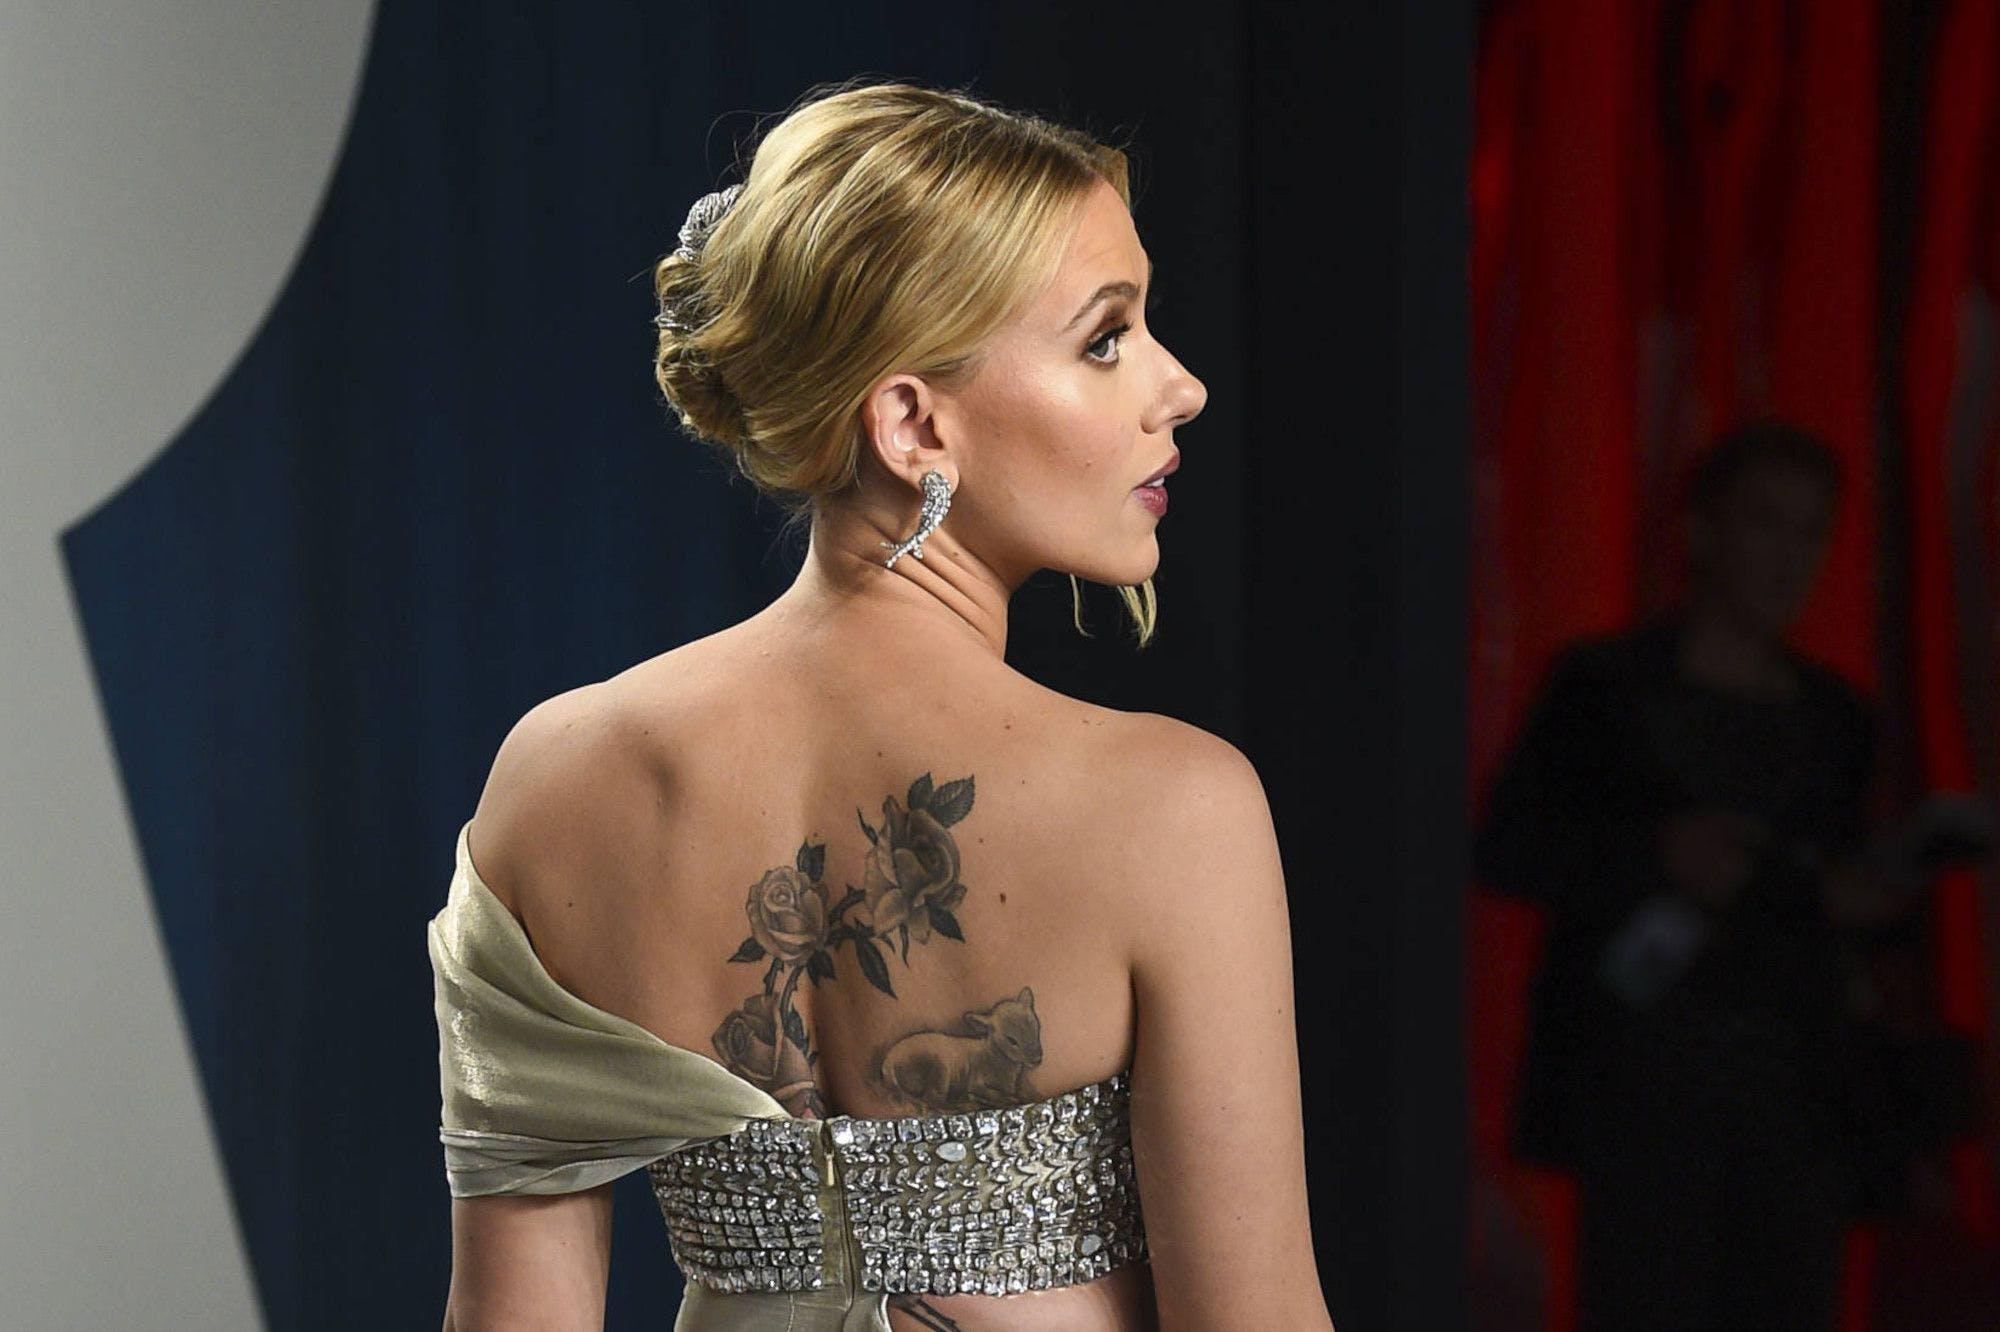 Forbes Celebrity 100 list: Scarlett Johansson